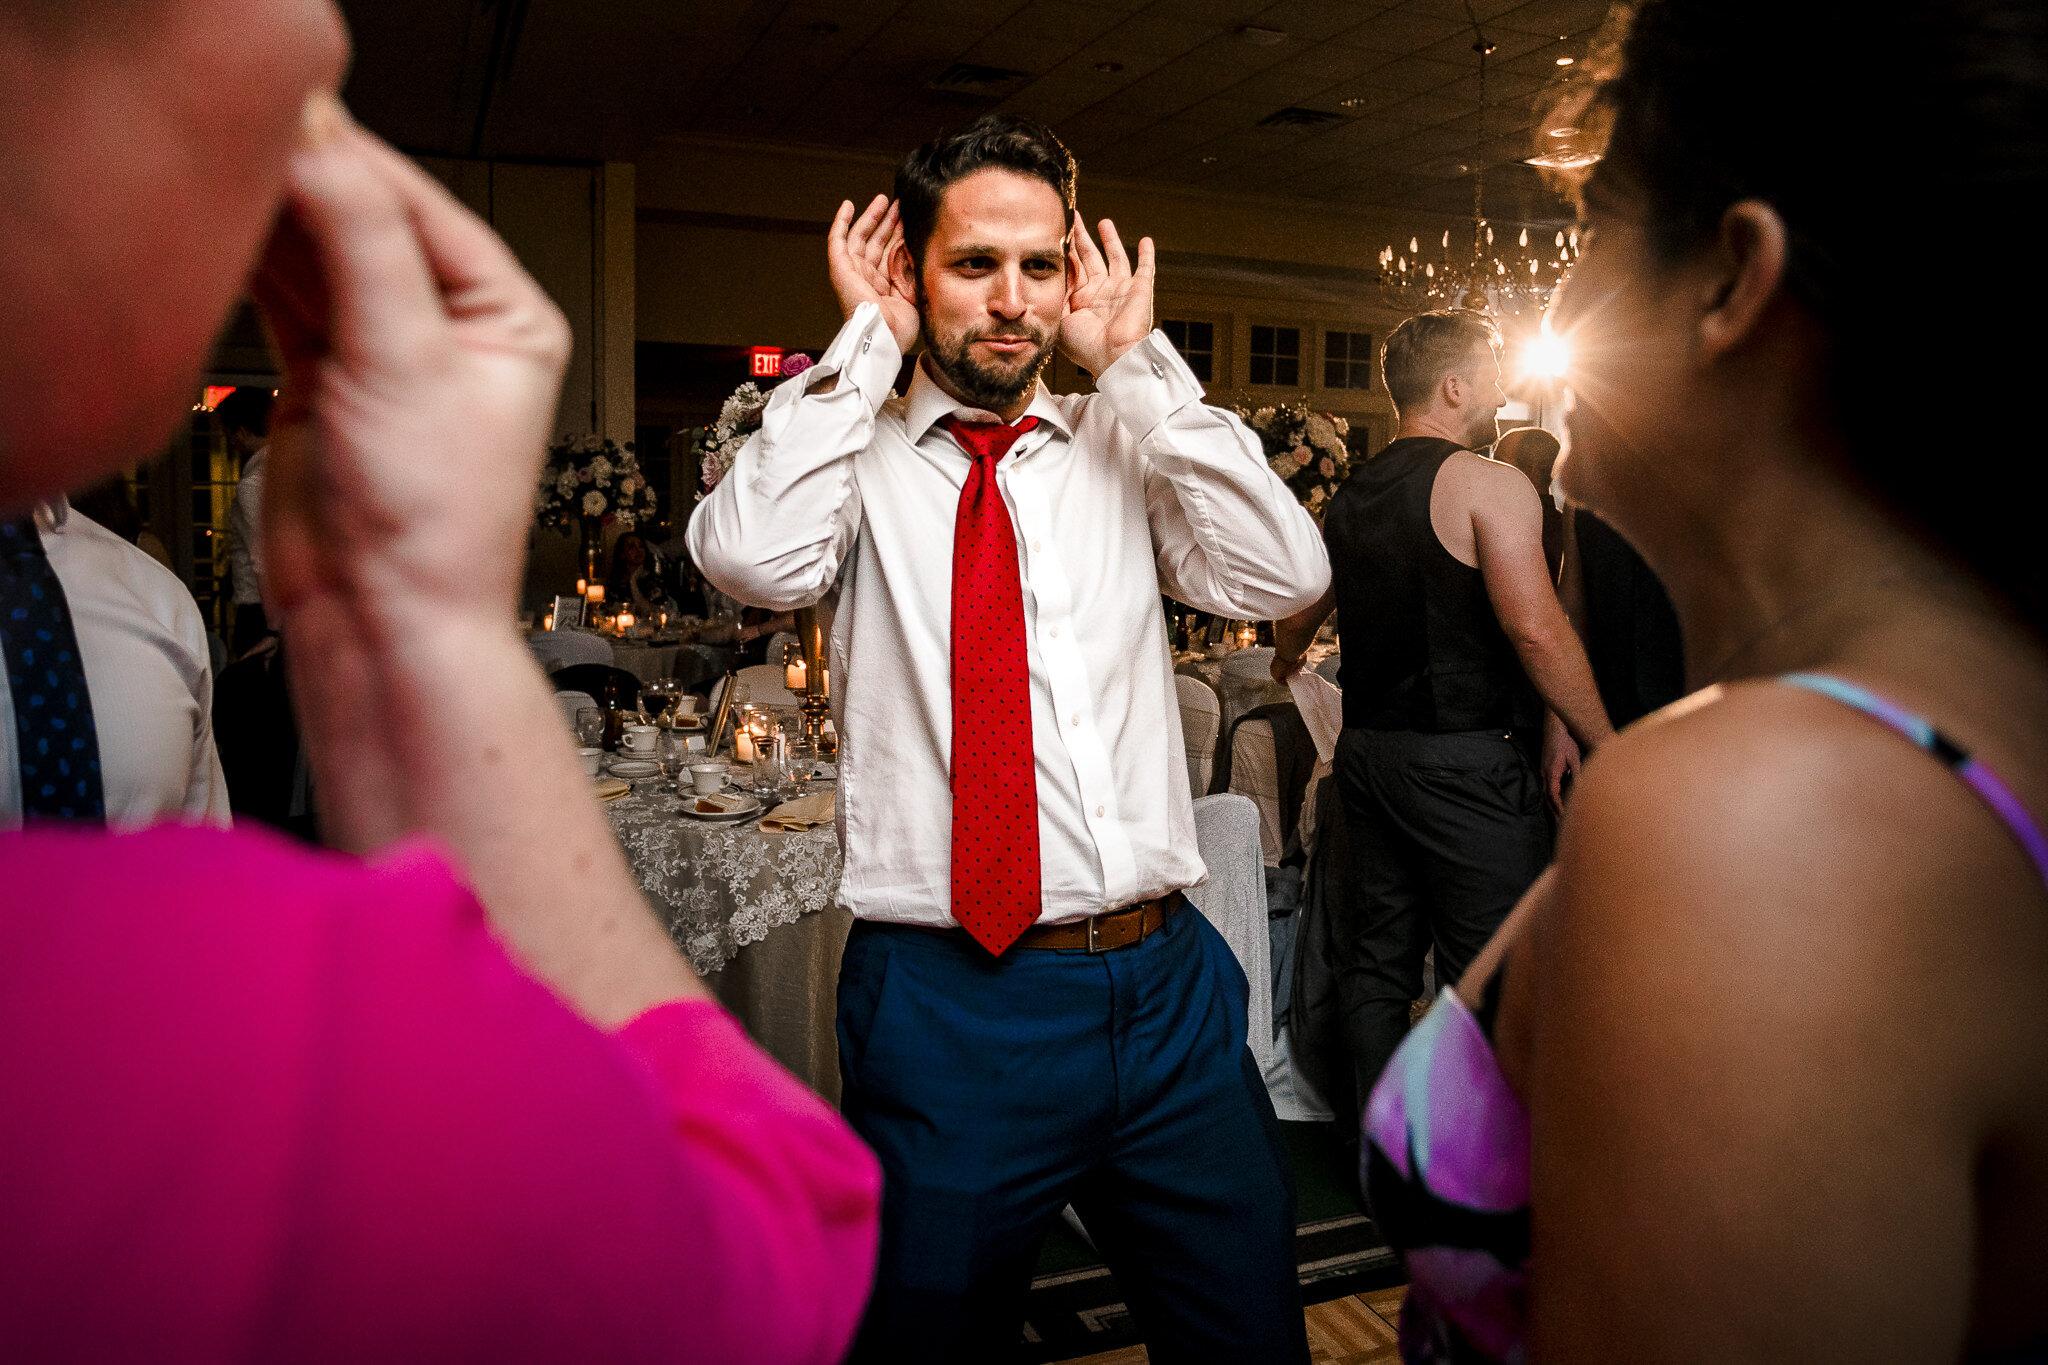 Coyle-Forsgate-Country-Club-Wedding-Photographer-59.JPG